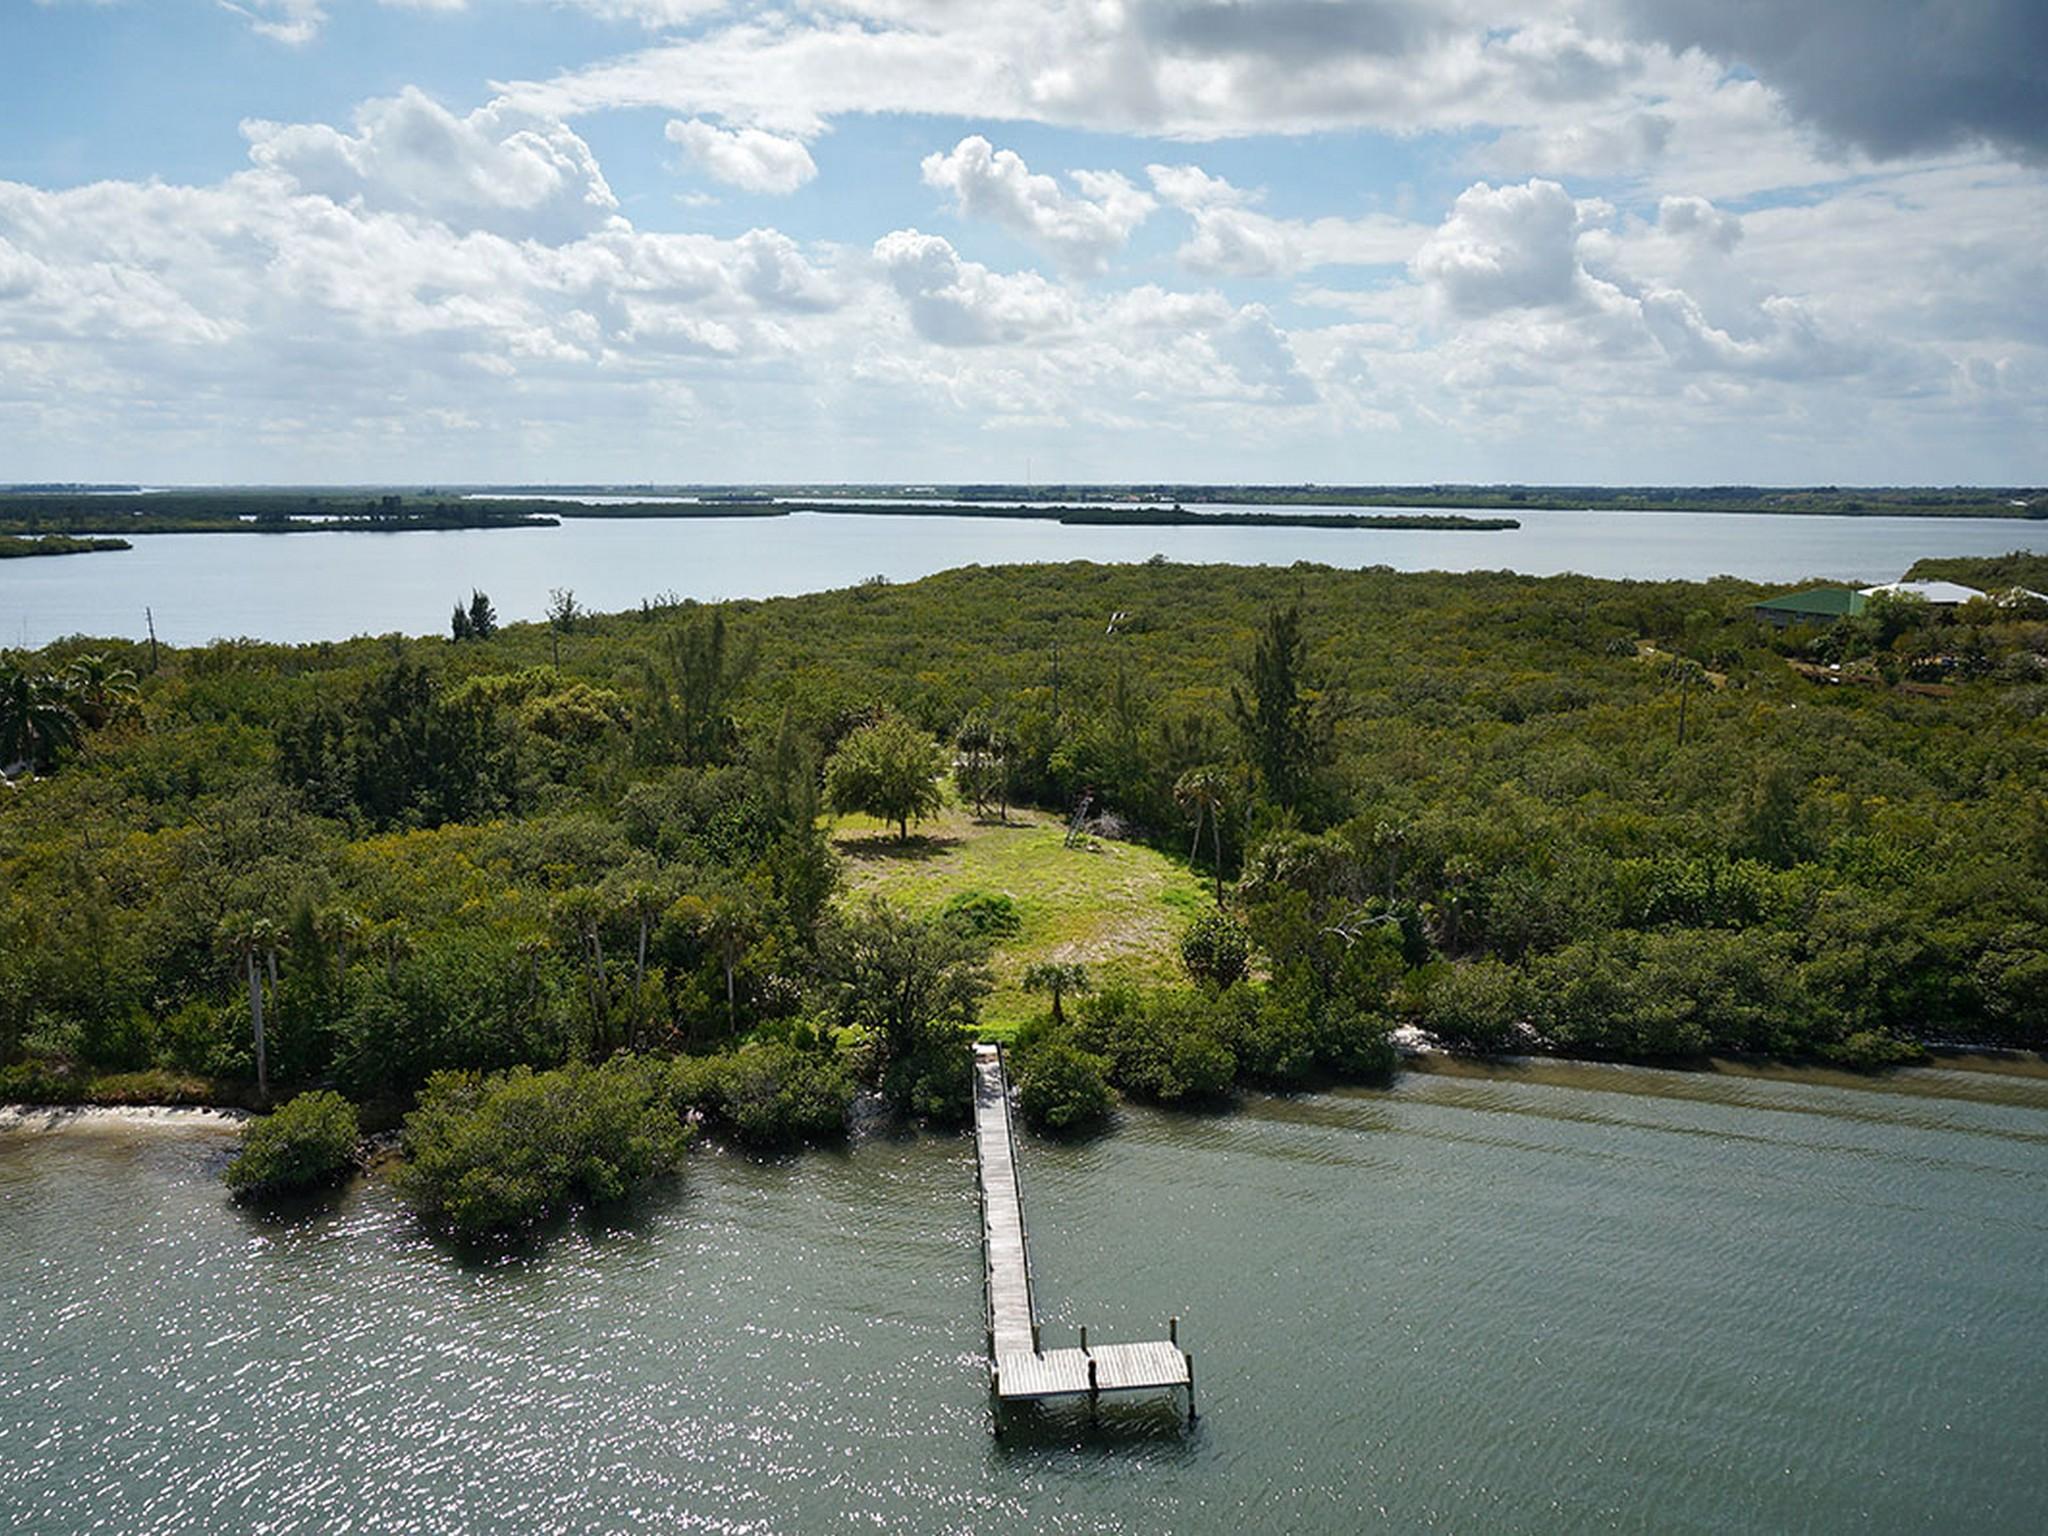 Land for Sale at 3+ Acre Riverfront Homesite 250 Live Oak Lane Vero Beach, Florida, 32963 United States